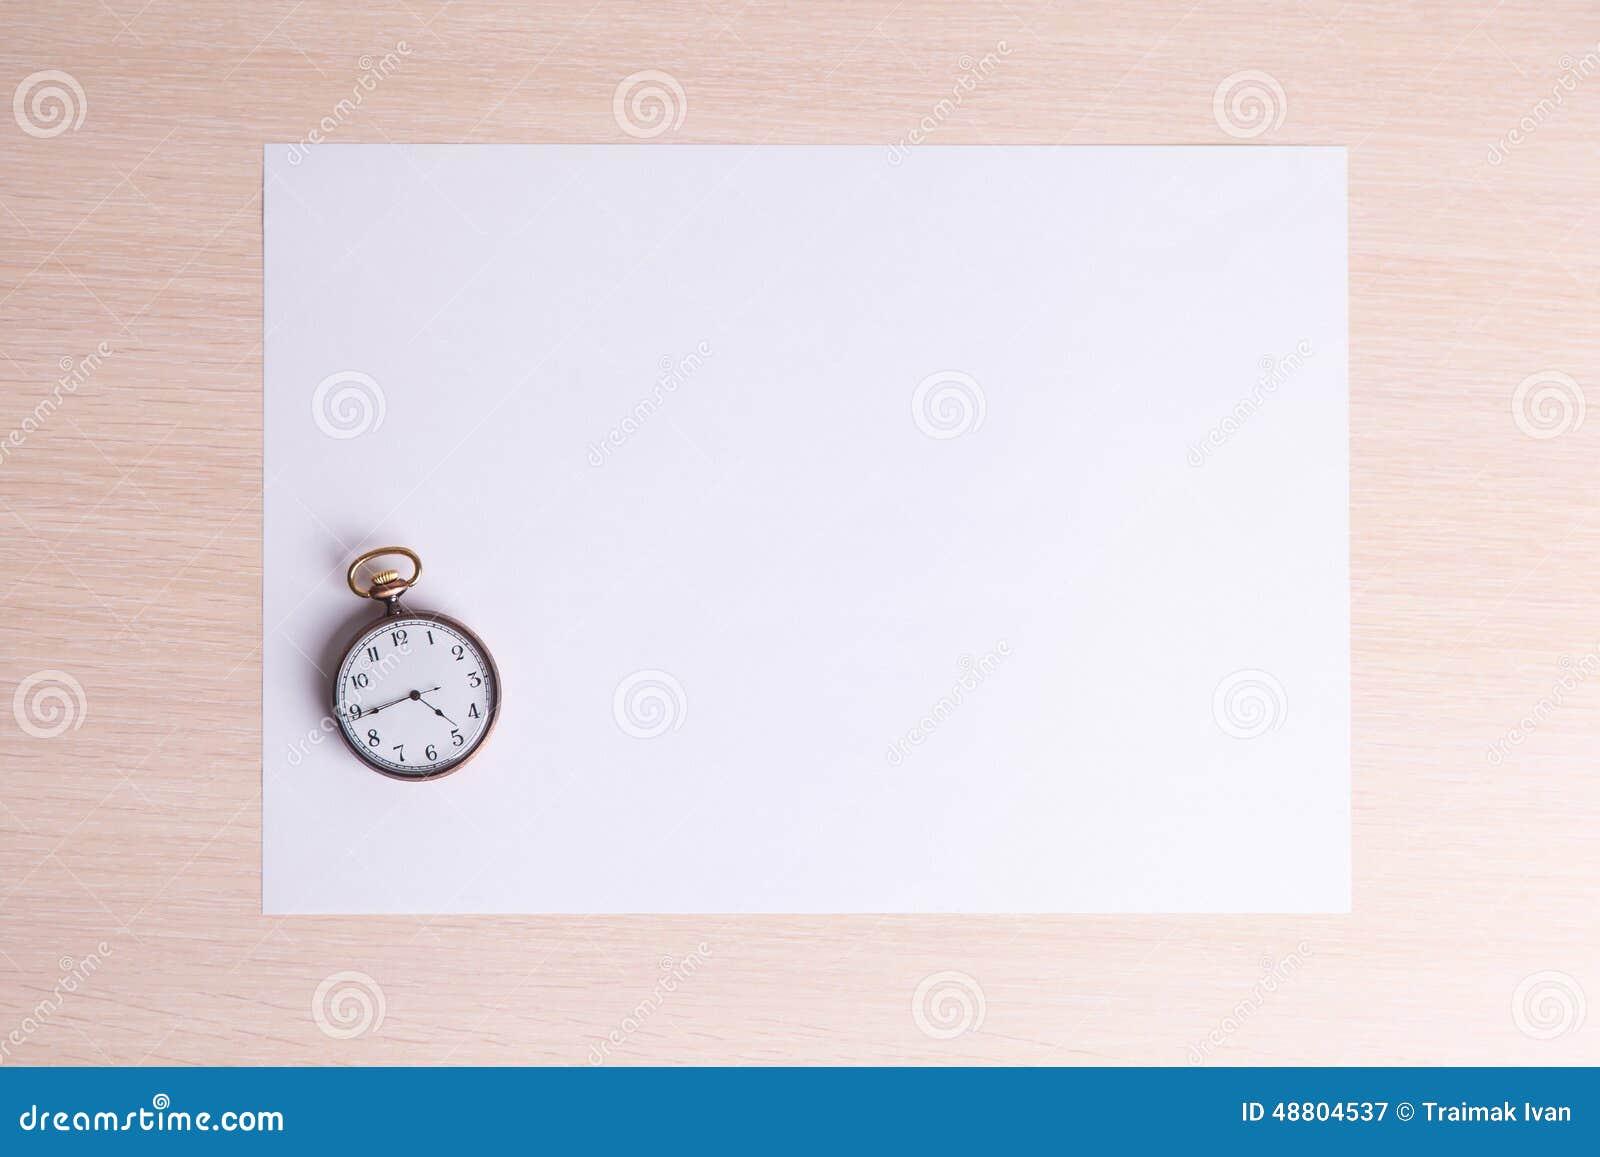 Blank Sheet of Paper for Letter